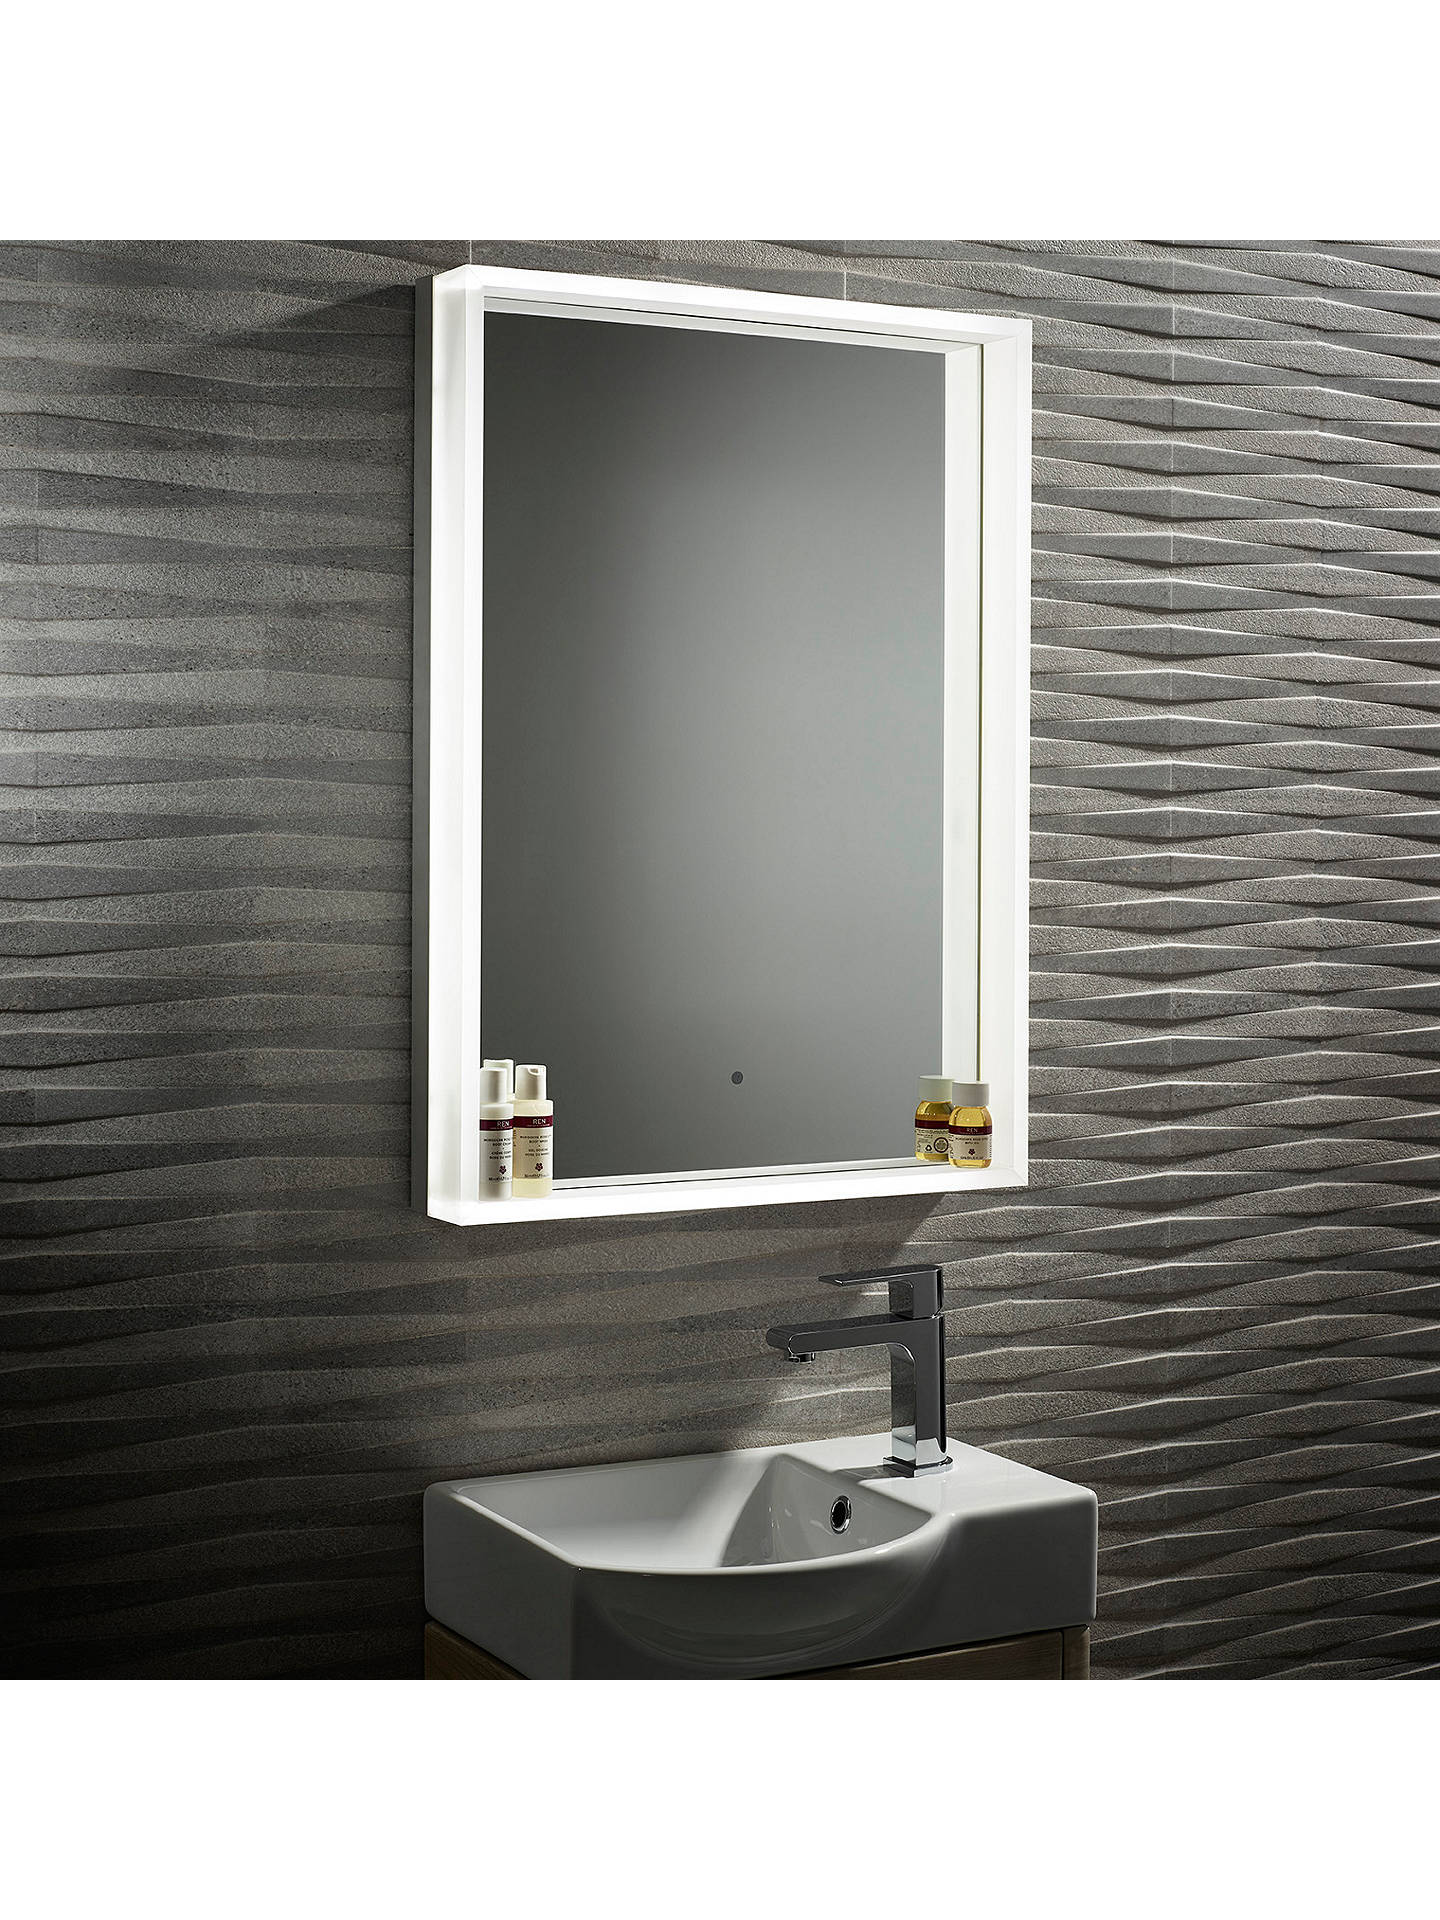 Bathroom Mirrors Illuminated: Roper Rhodes Aura Illuminated LED Bathroom Mirror At John